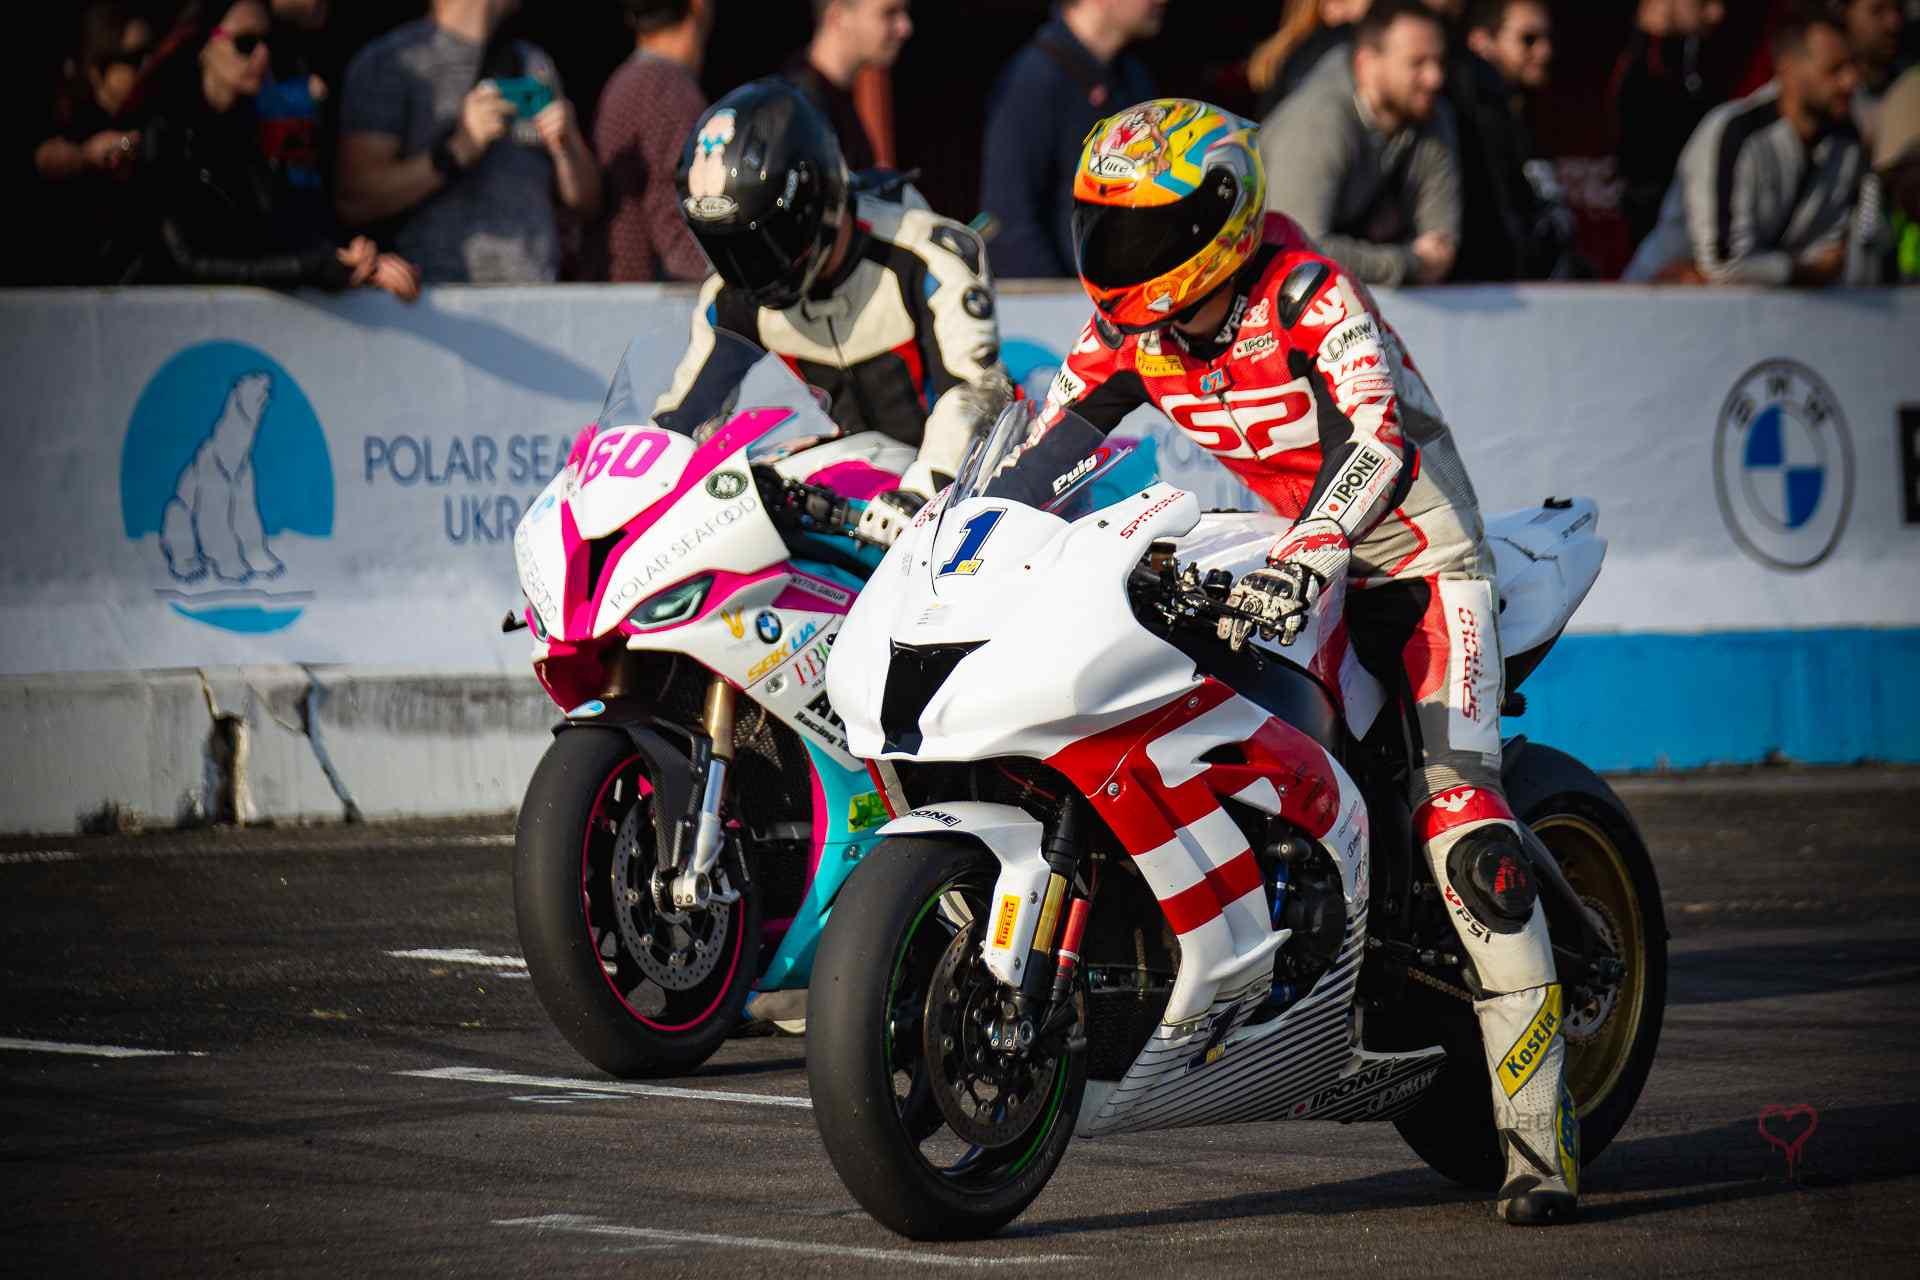 5-6_etap_MotoGPUkraine_093